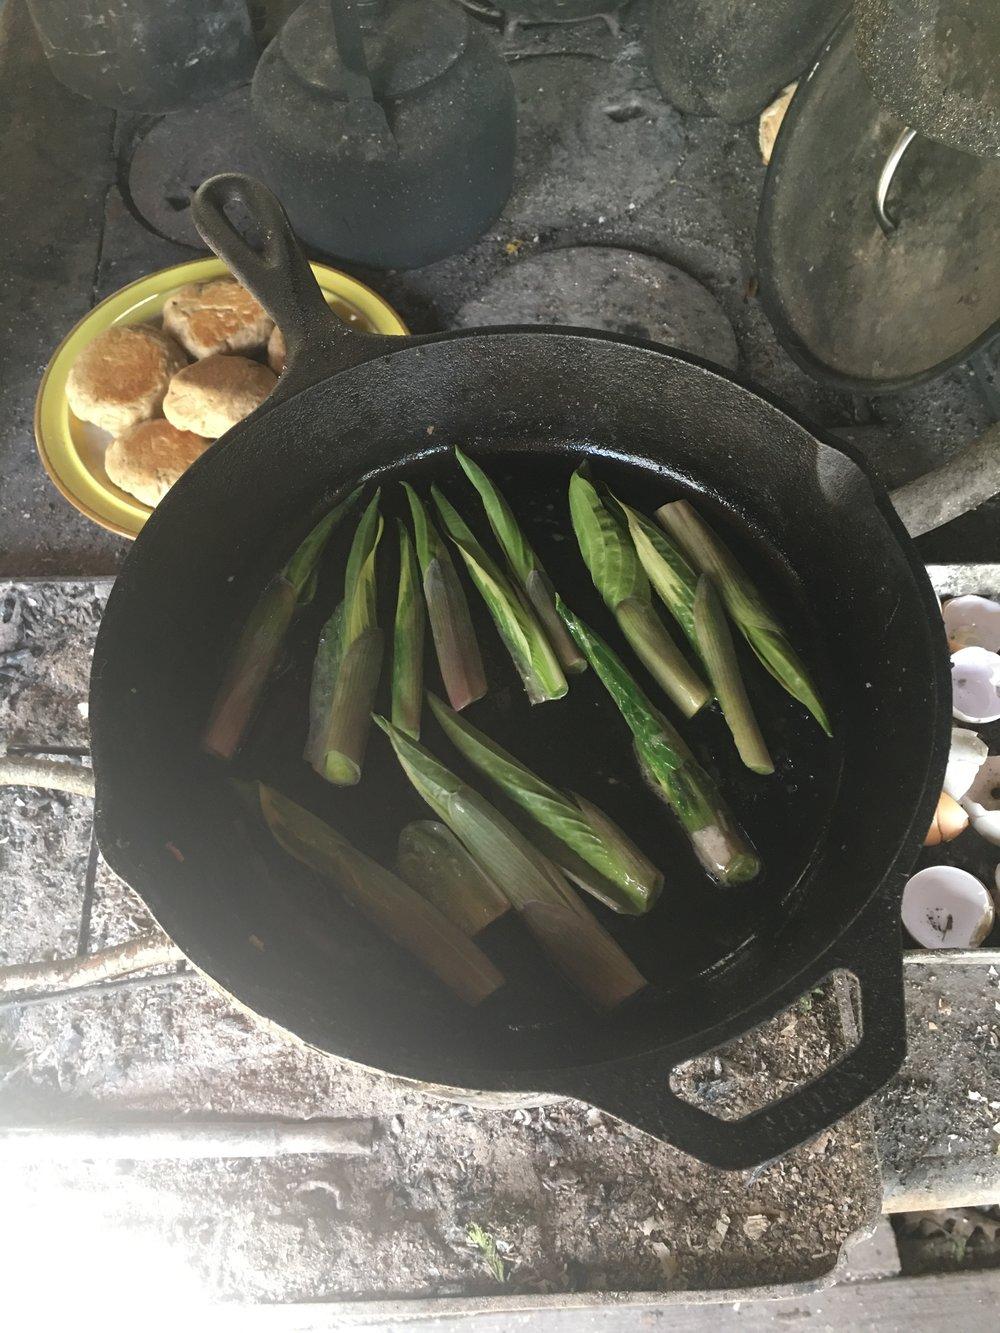 Hosta shoots frying